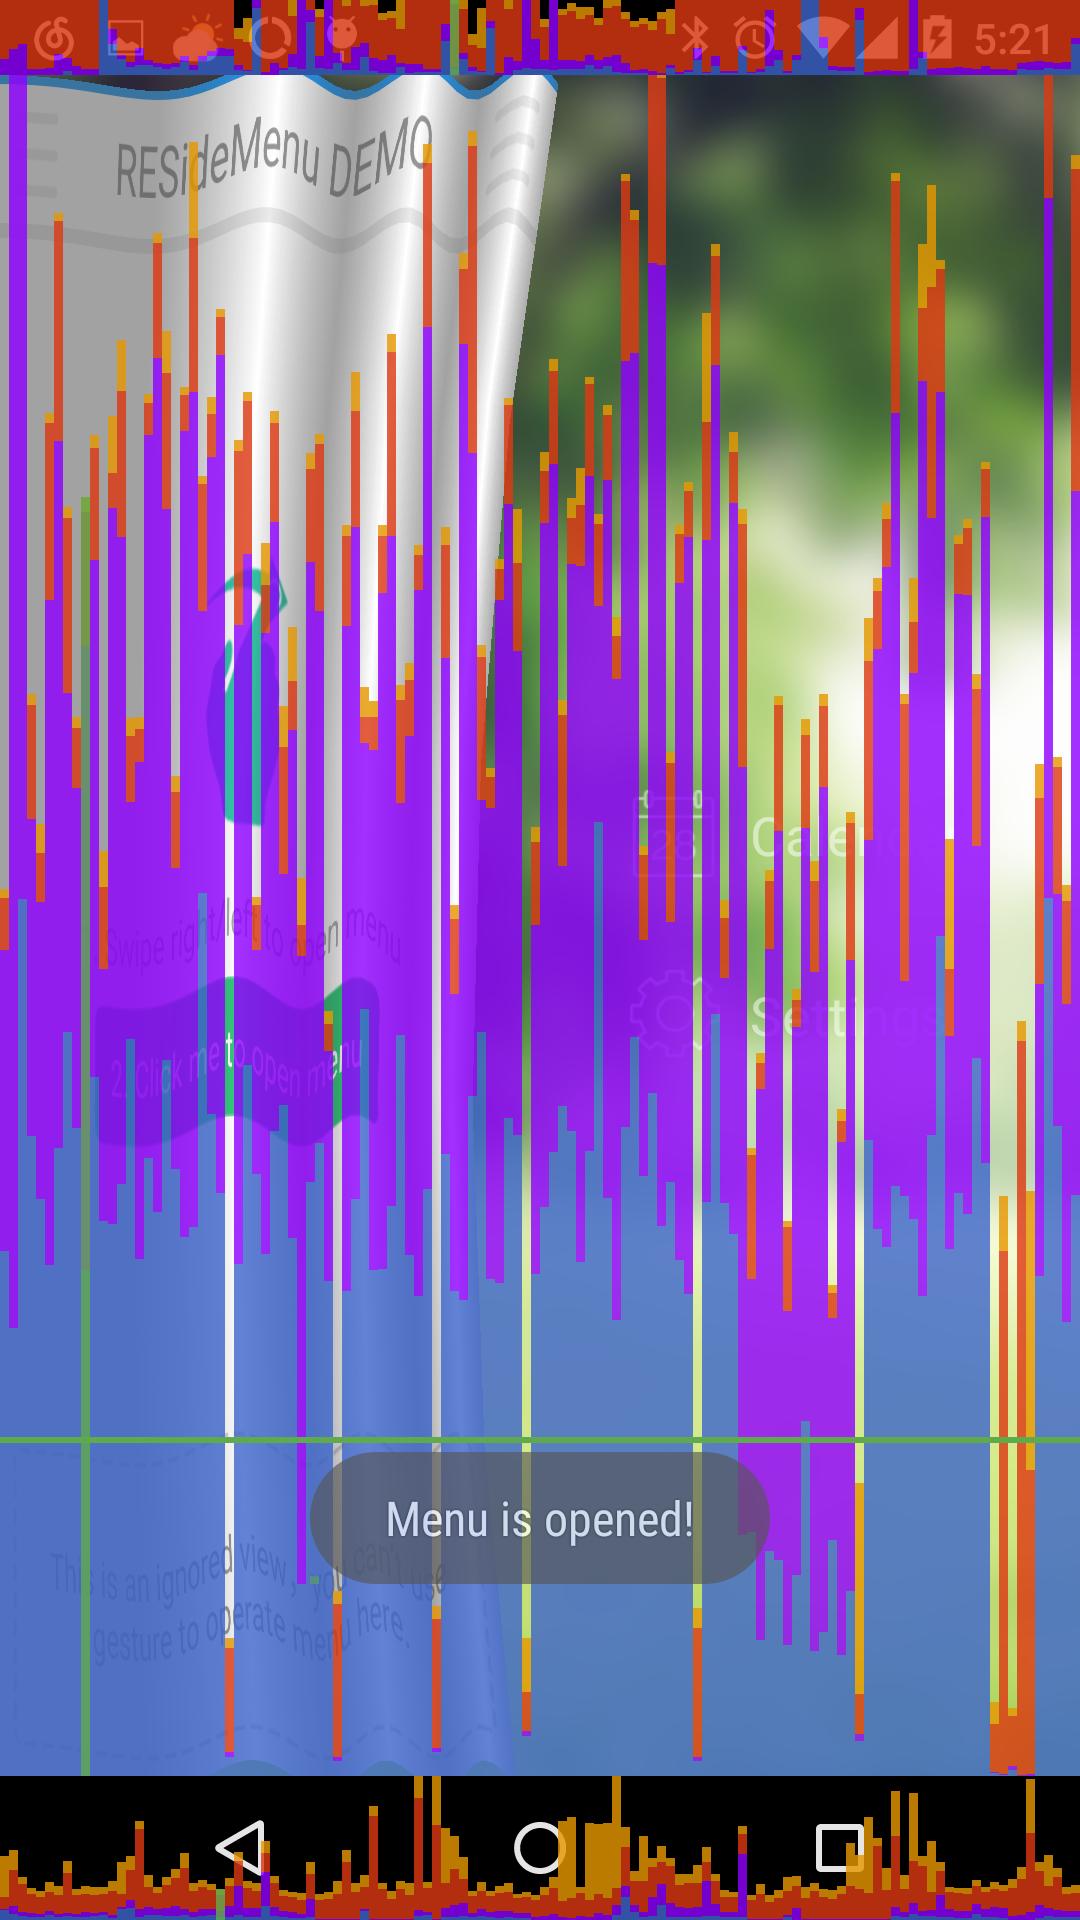 screenshot_2015-05-25-17-21-24